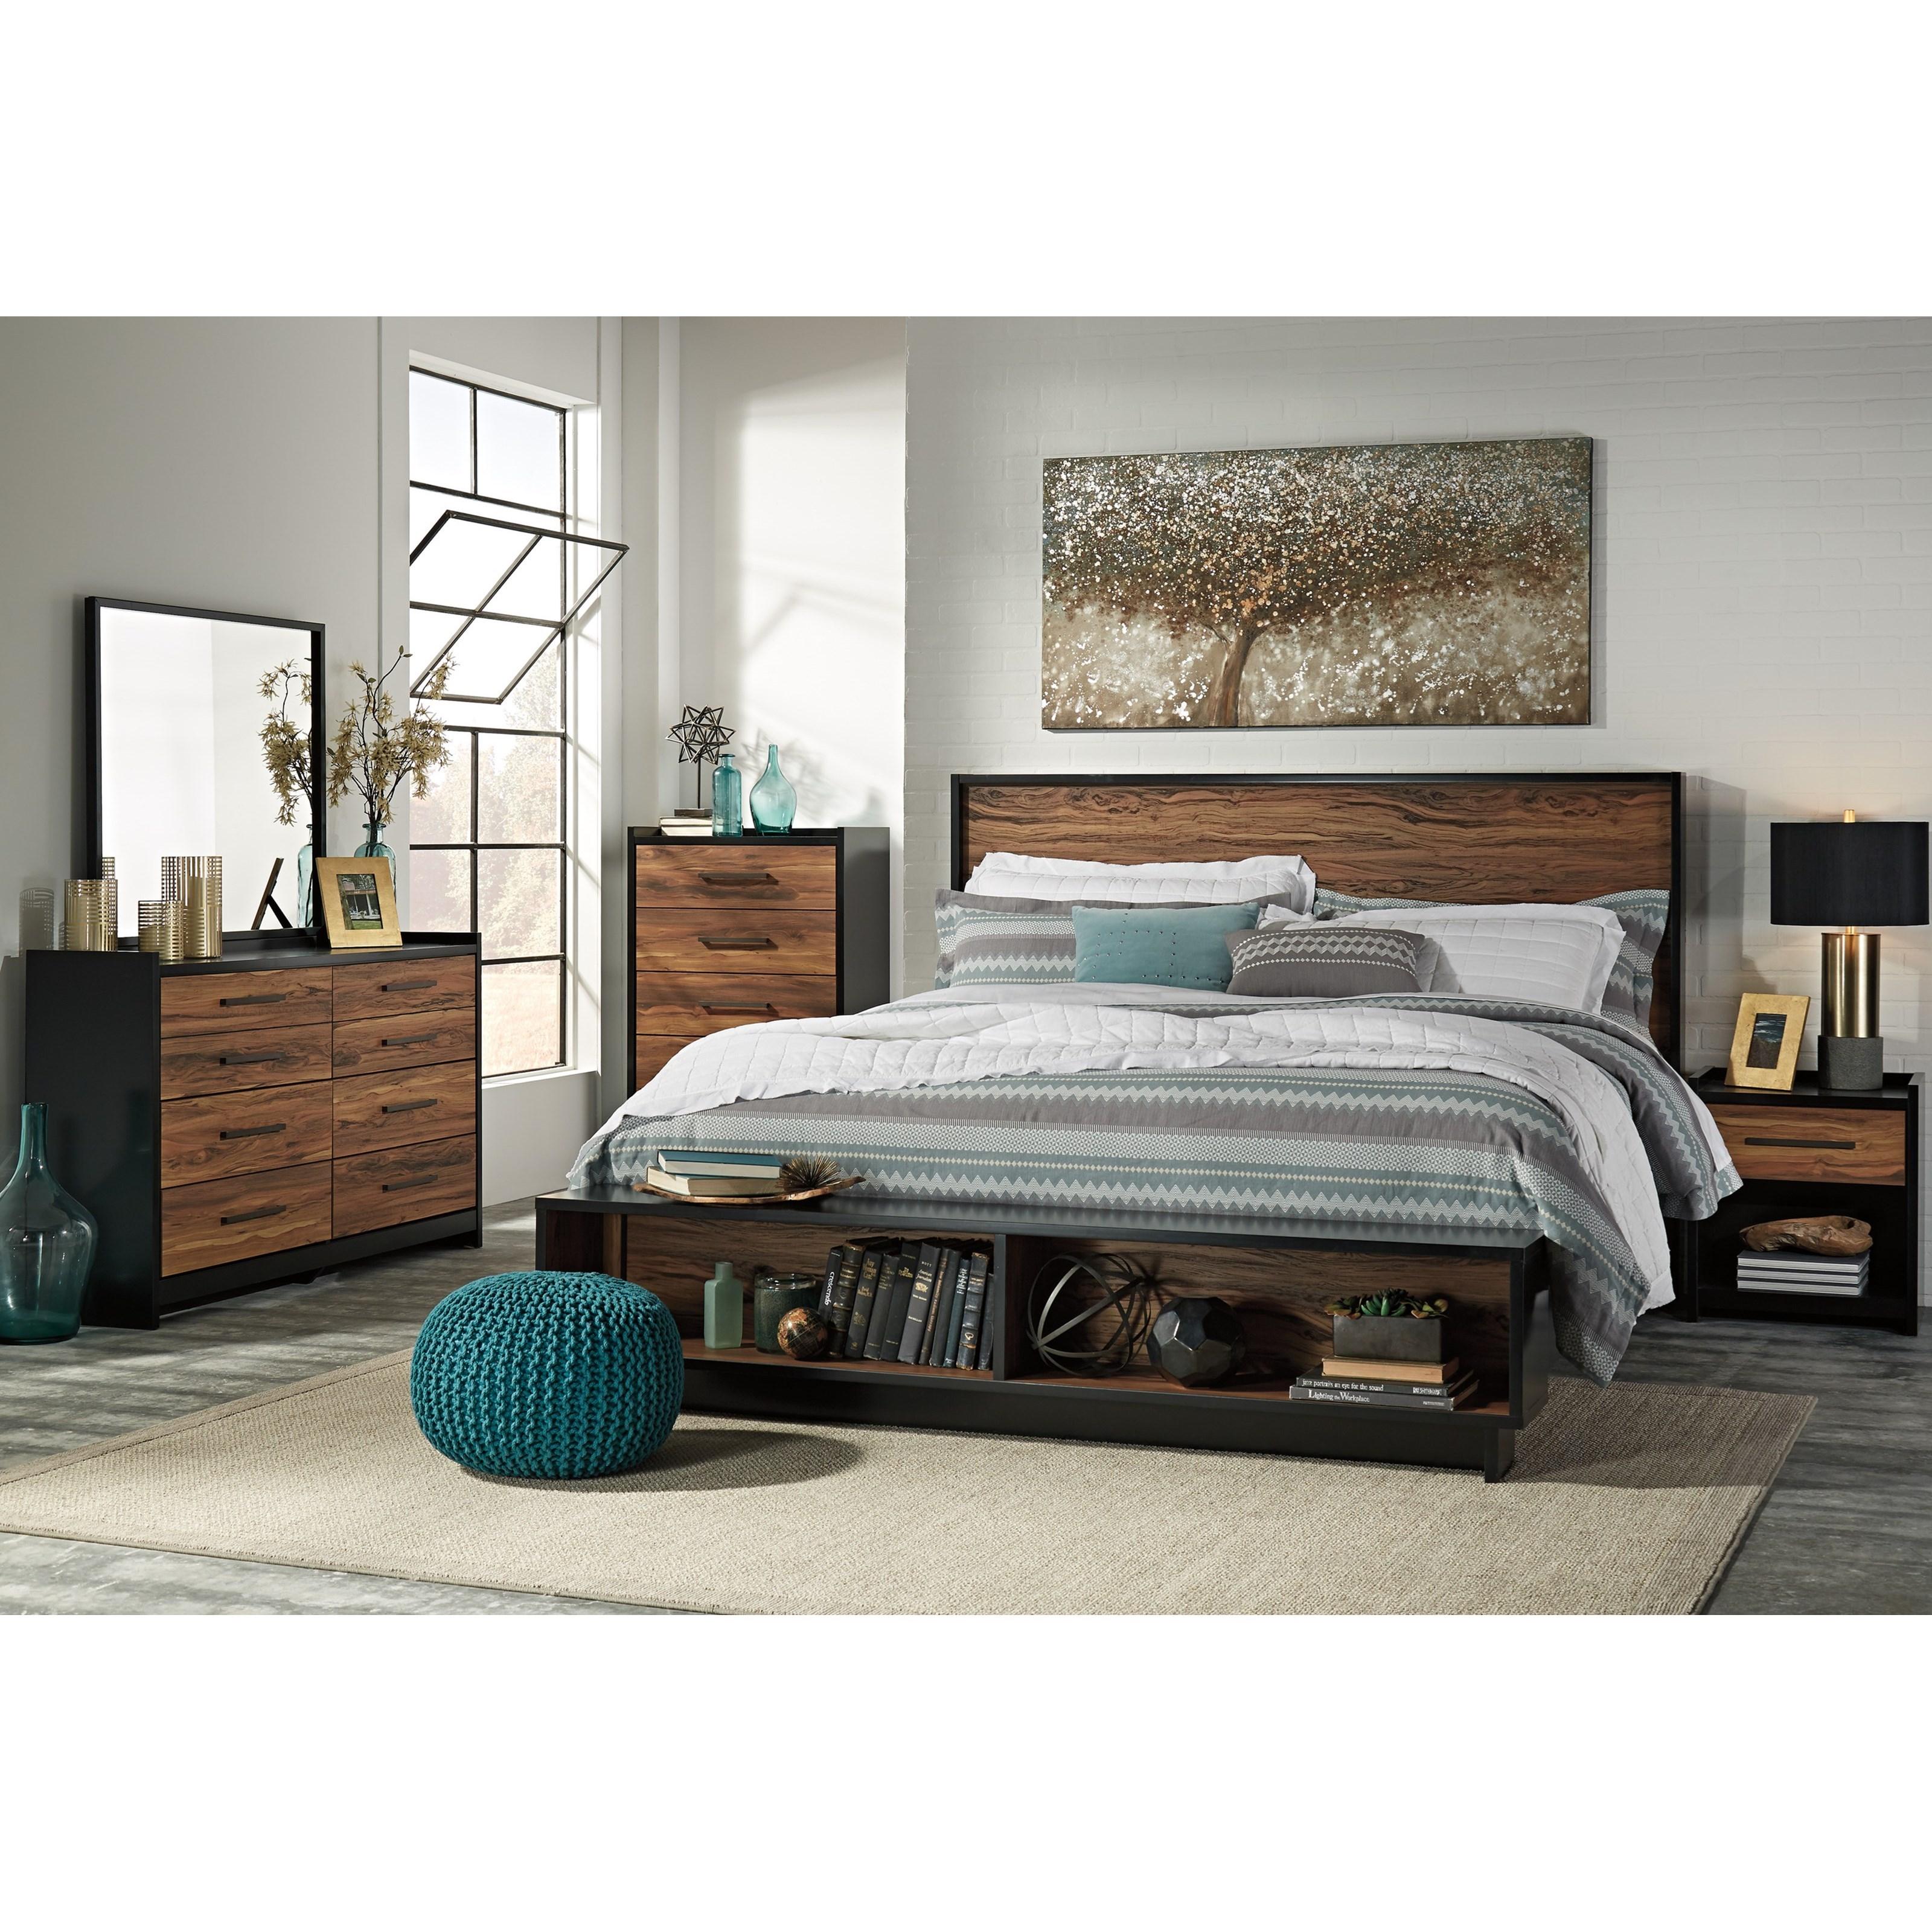 Signature Design by Ashley Stavani King Bedroom Group - Item Number: B457 K Bedroom Group 1